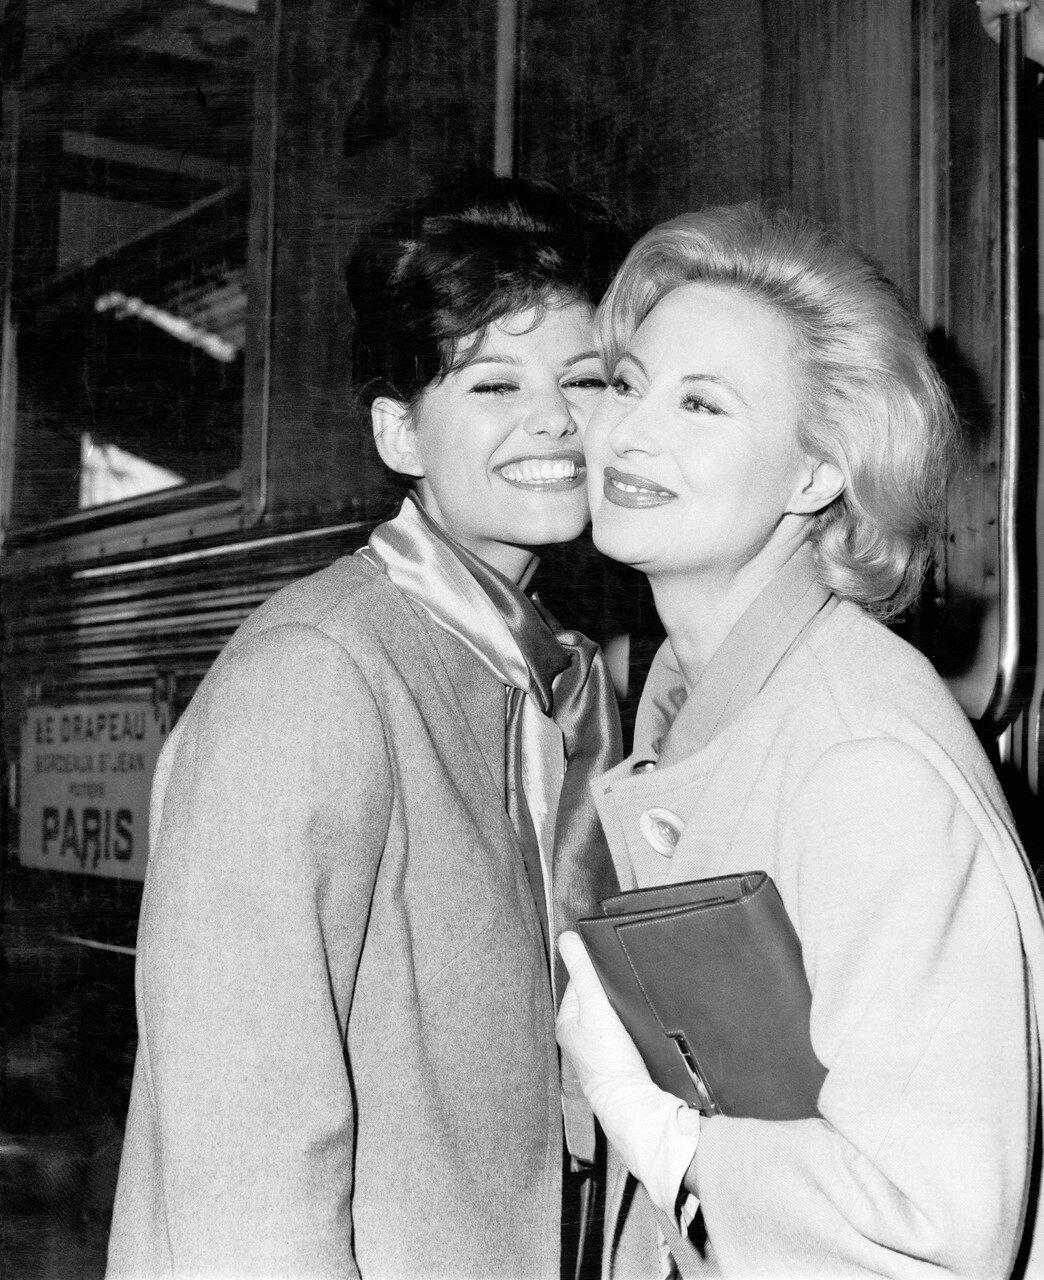 Claudia CARDINALE und Michele MORGAN am Gare d'Austerlitz, Paris 1961